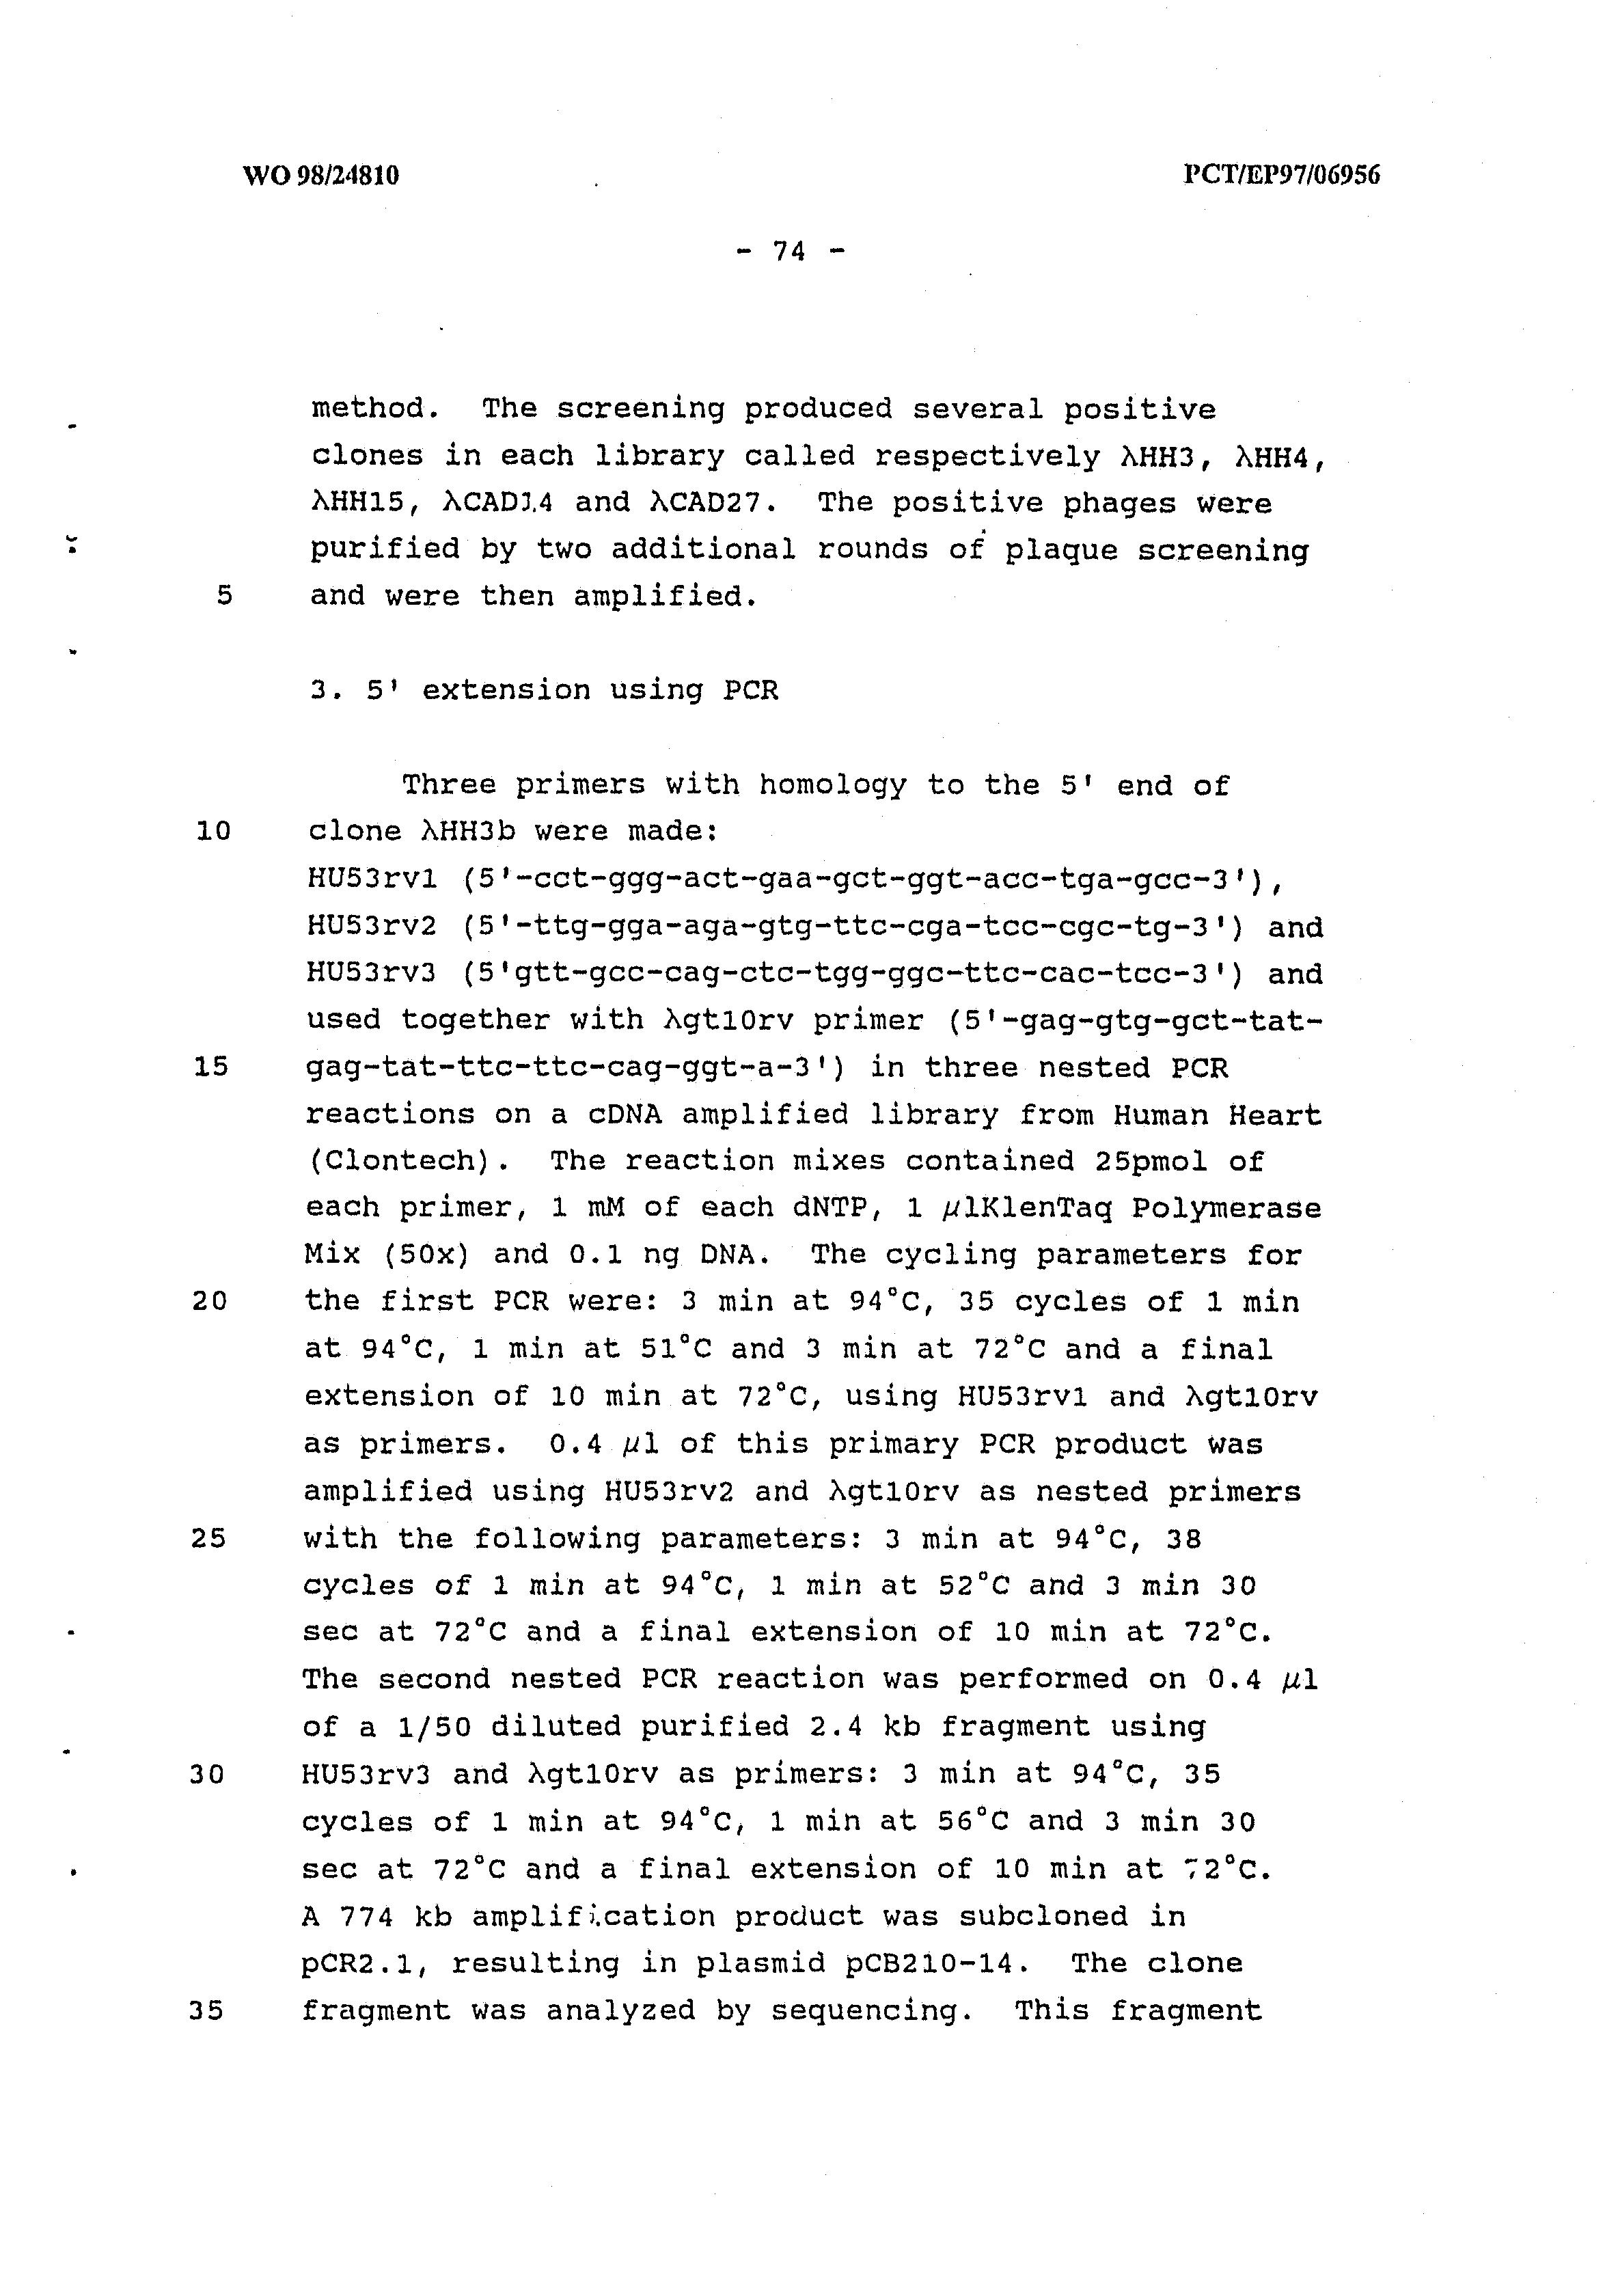 AU 1998/056622 A - Vertebrate Homologues Of Unc-53 Protein